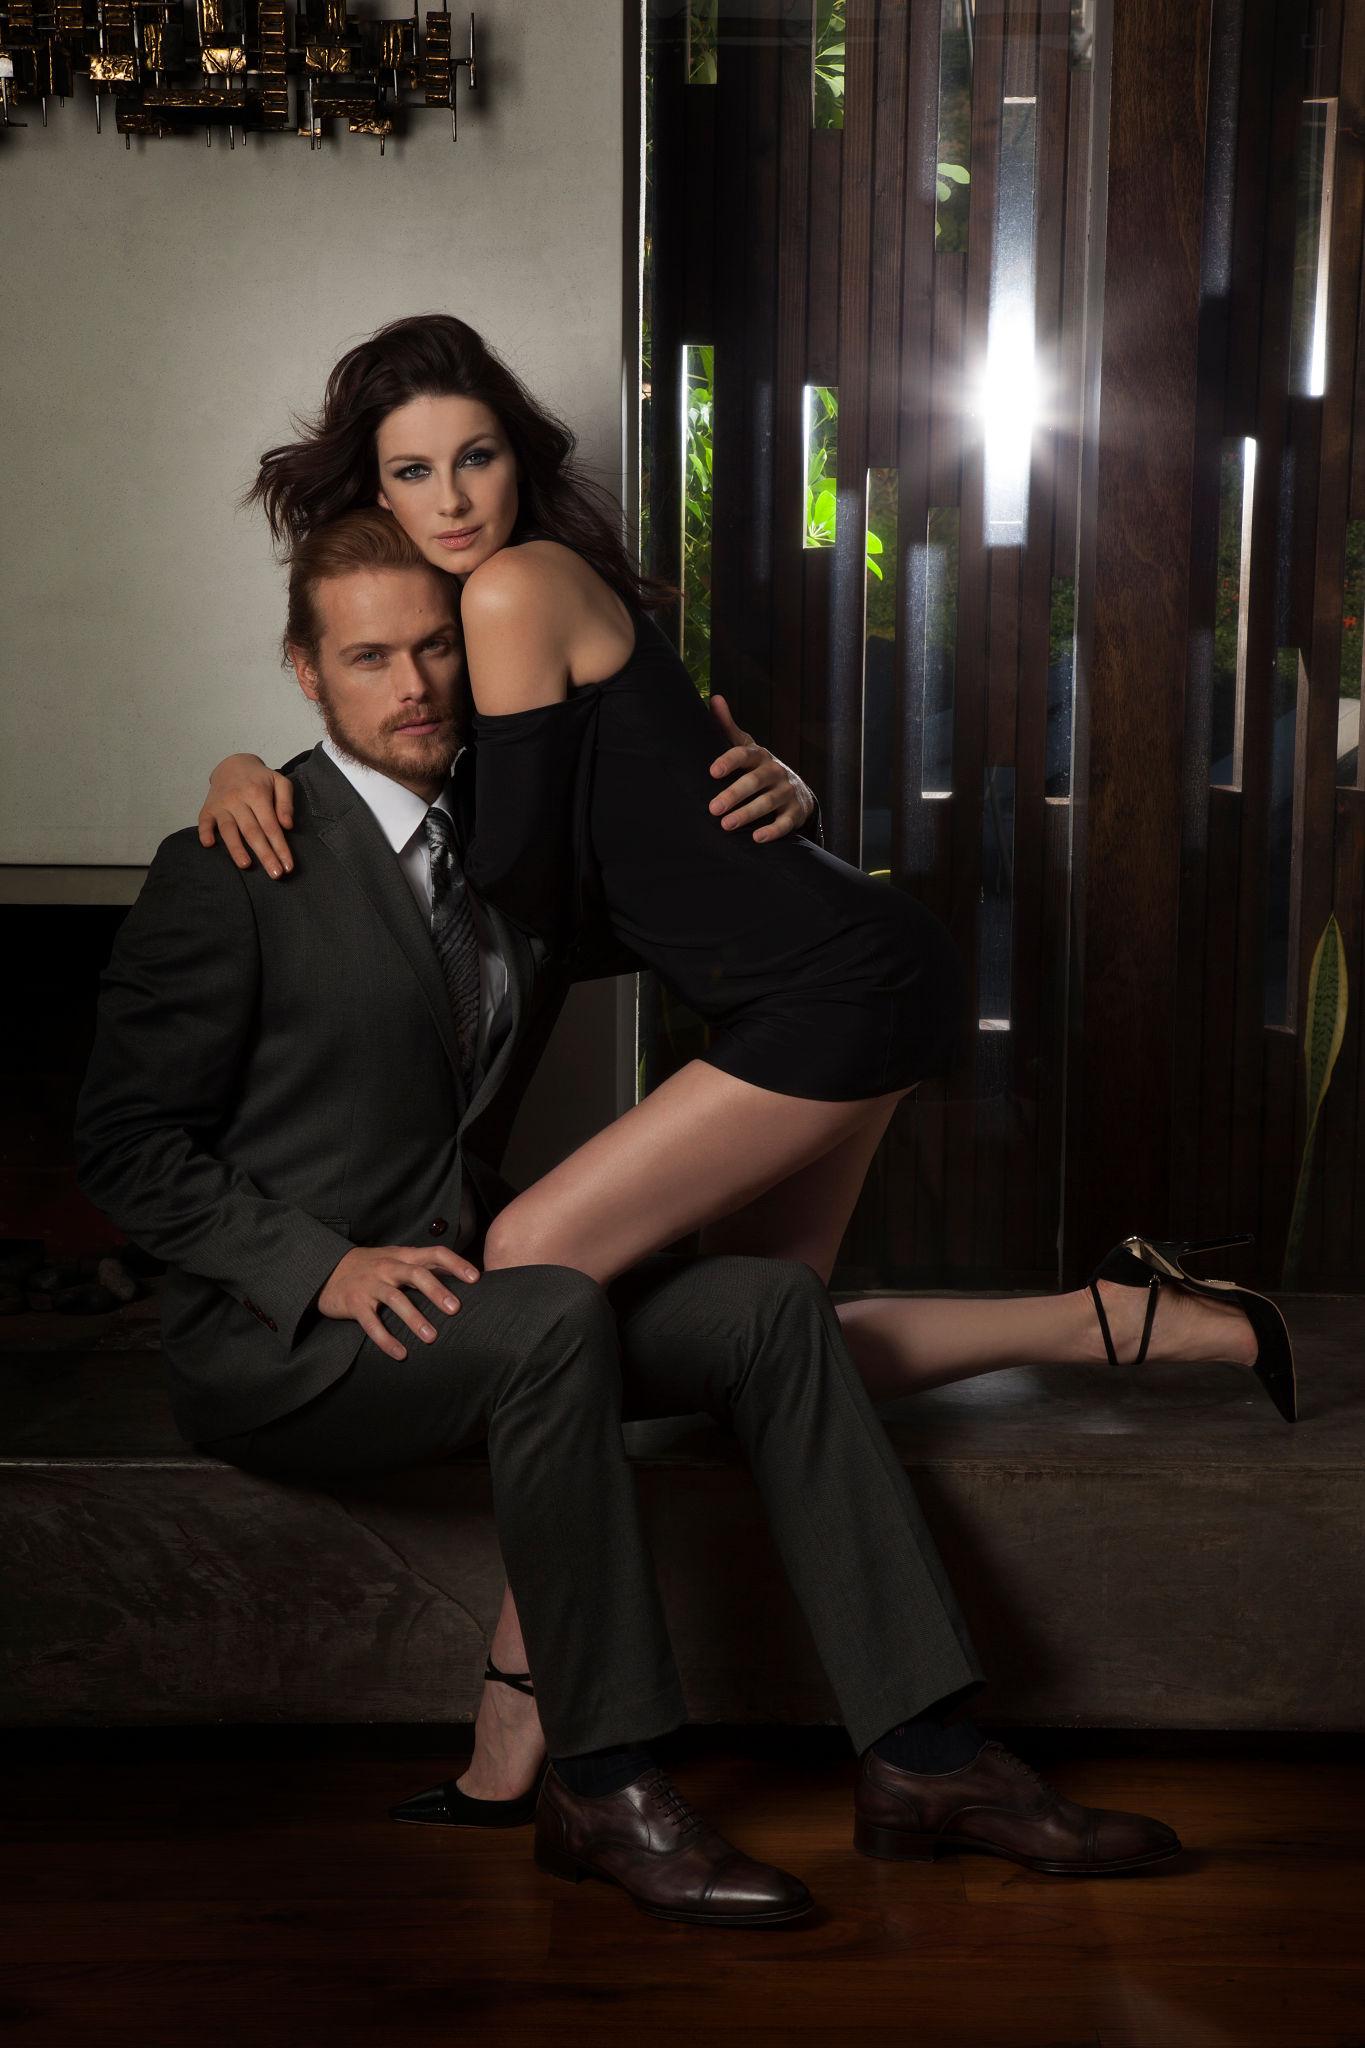 Sam Heughan and Caitriona Balfe Photoshot - Sam Heughan foto